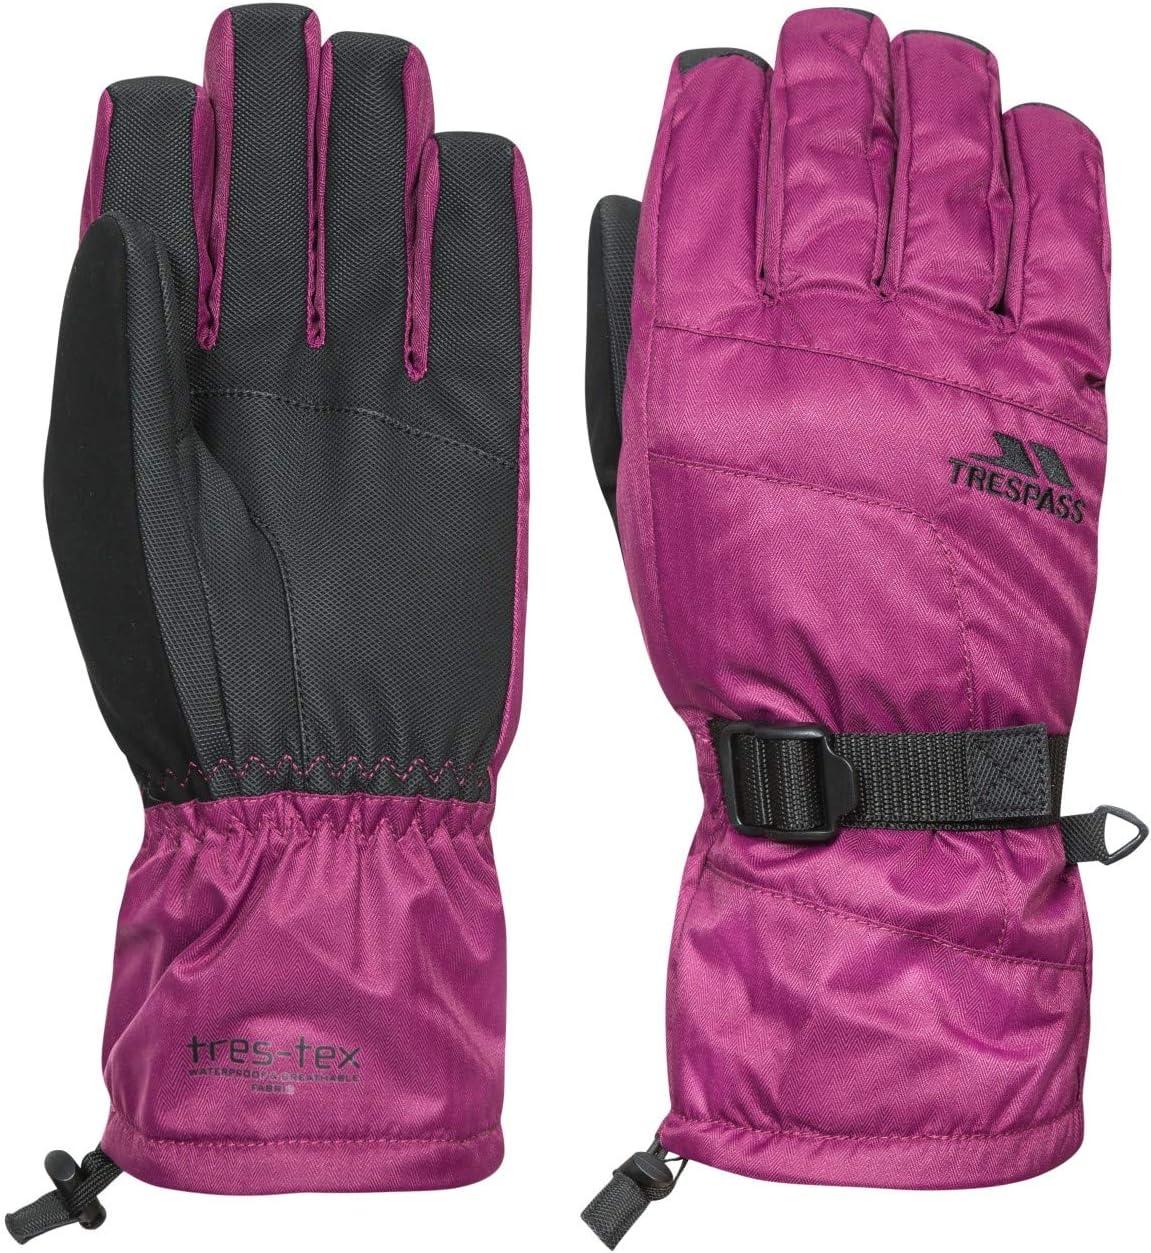 Trespass Women's Embray Gloves